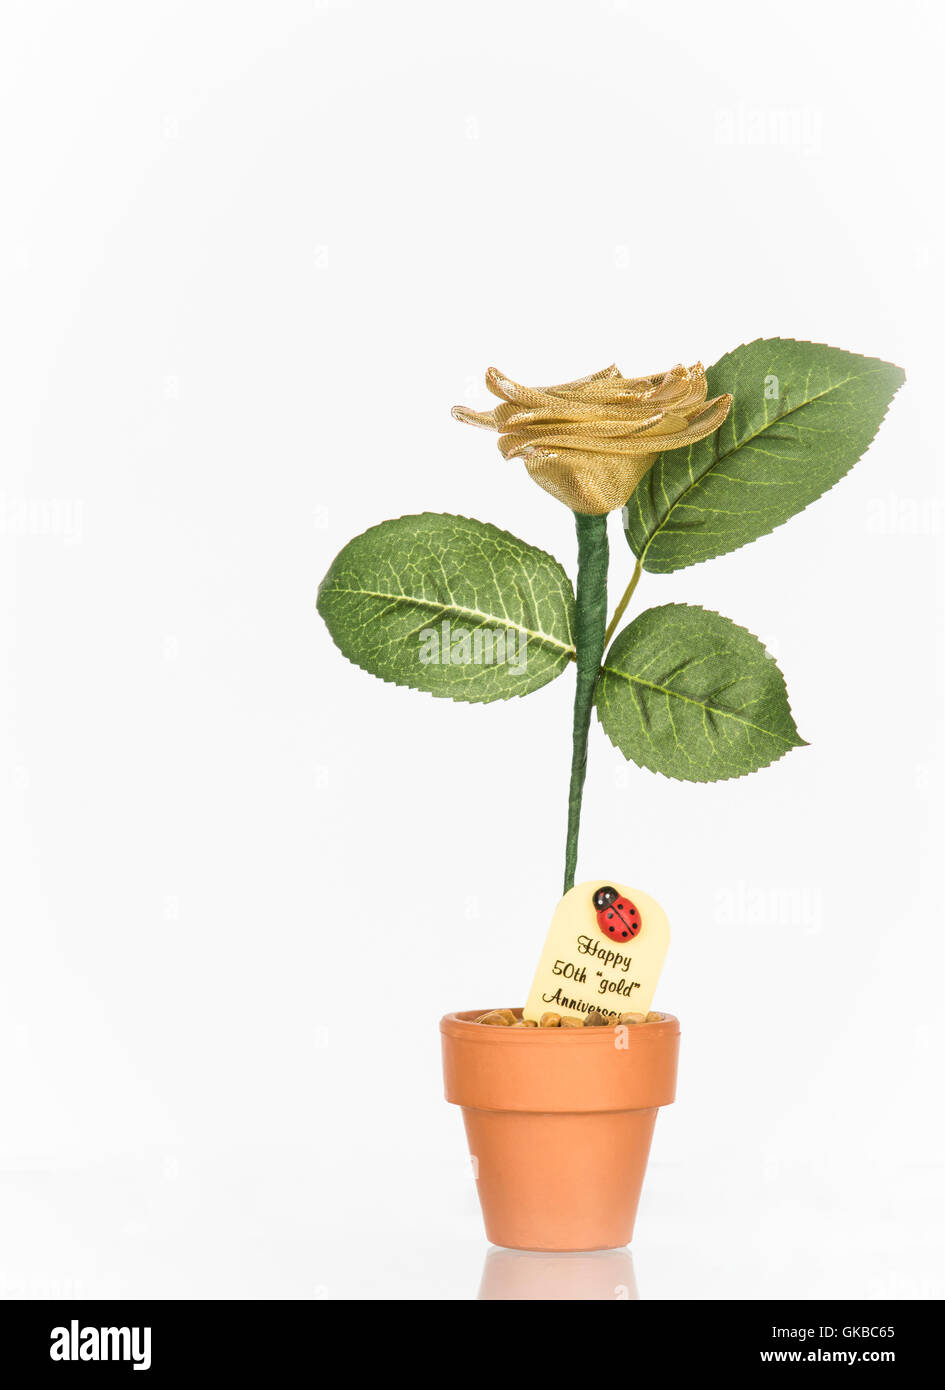 Golden anniversary flower - 'Happy 50th 'gold' anniversary' - Stock Image